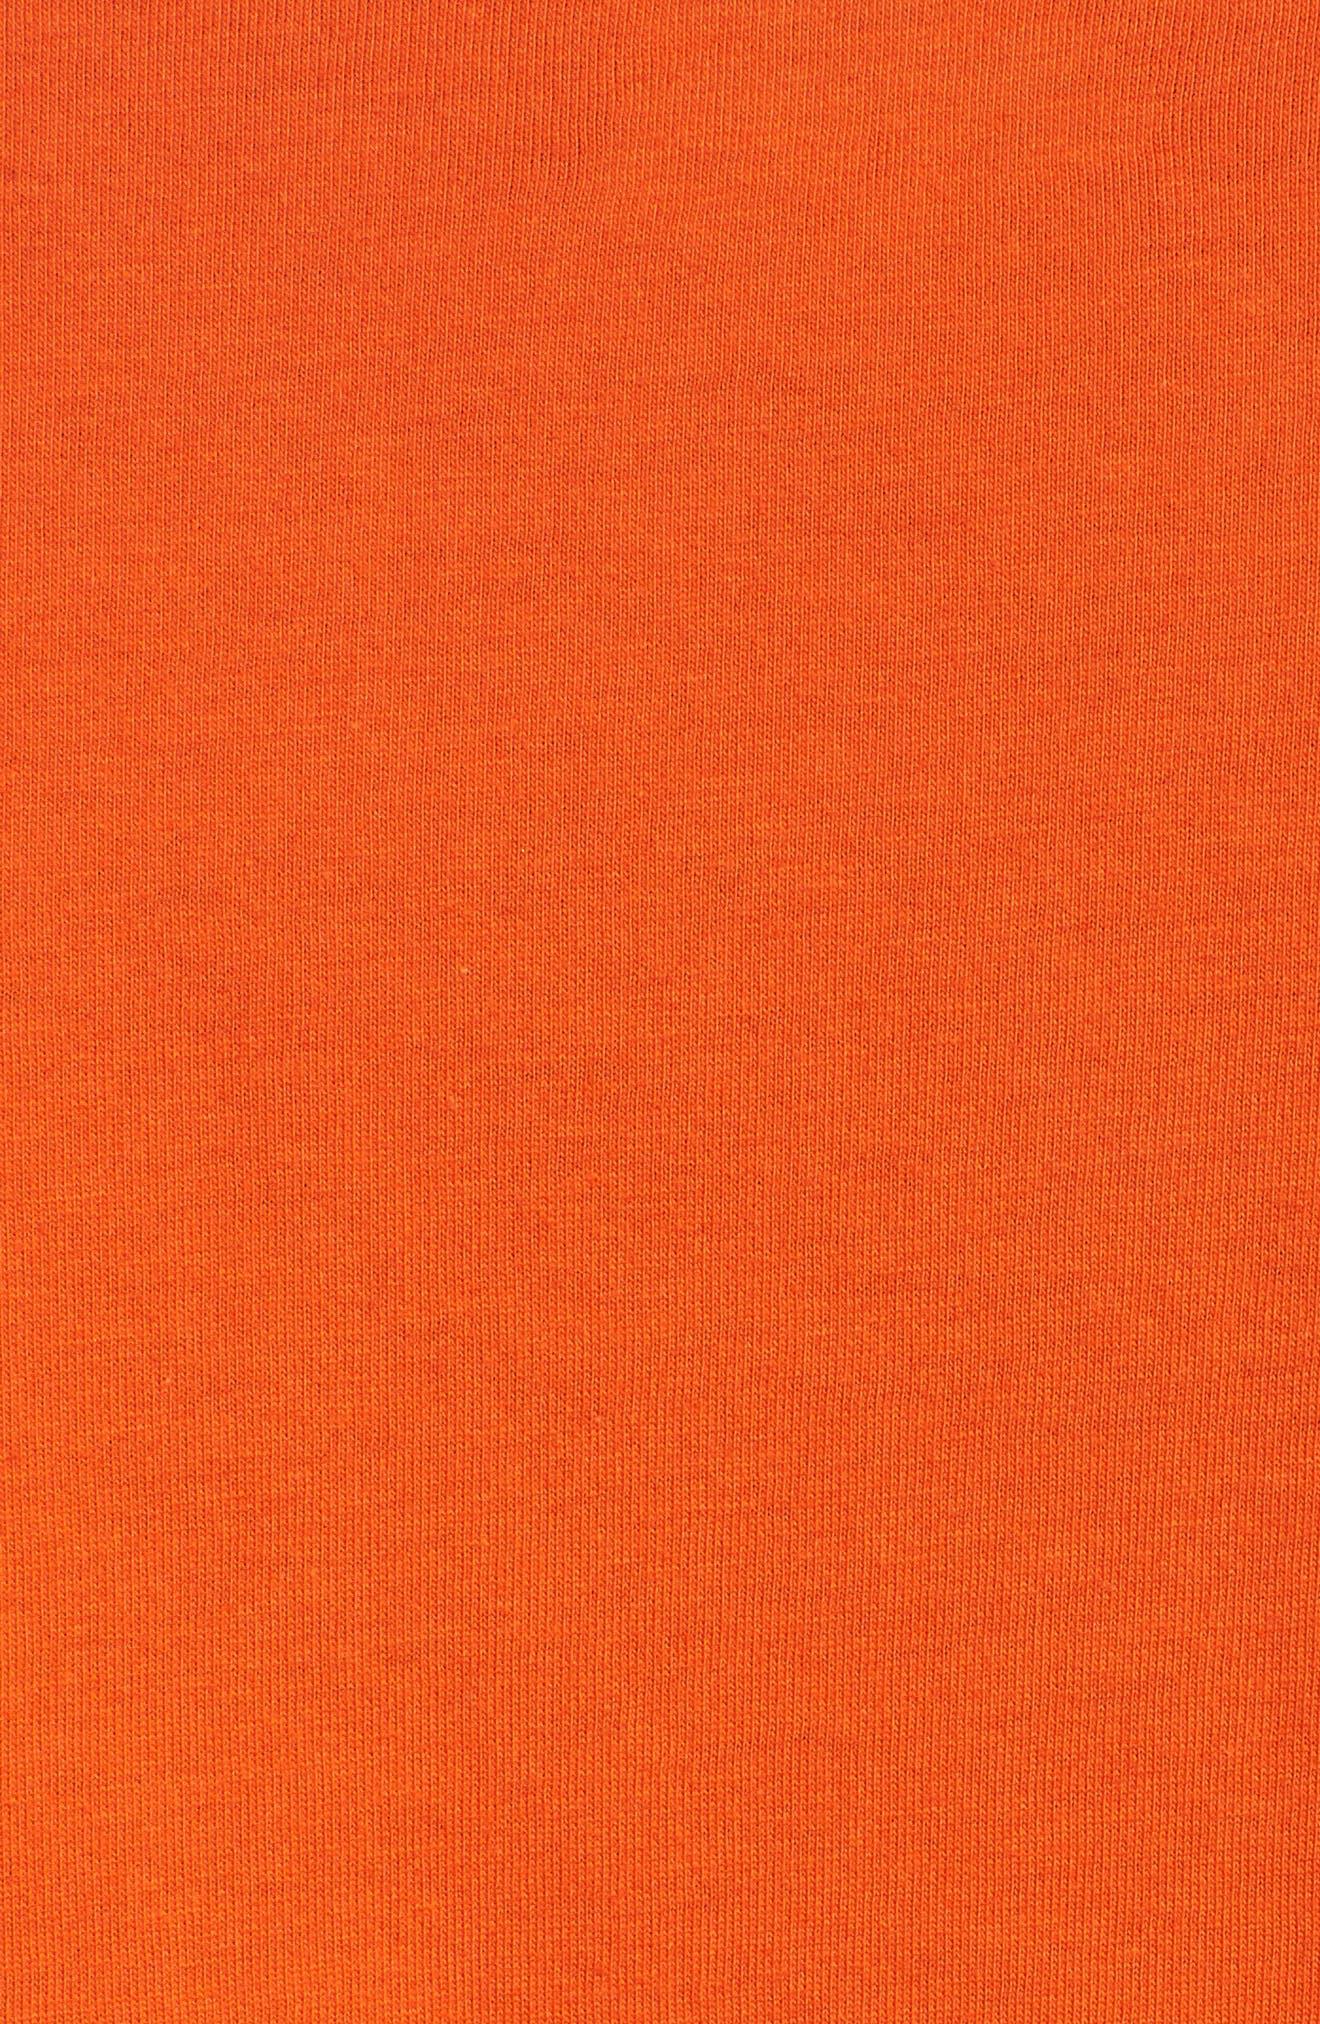 3-Pack Classic Fit T-Shirts,                             Alternate thumbnail 6, color,                             ORANGE/ GREEN/ ROYAL